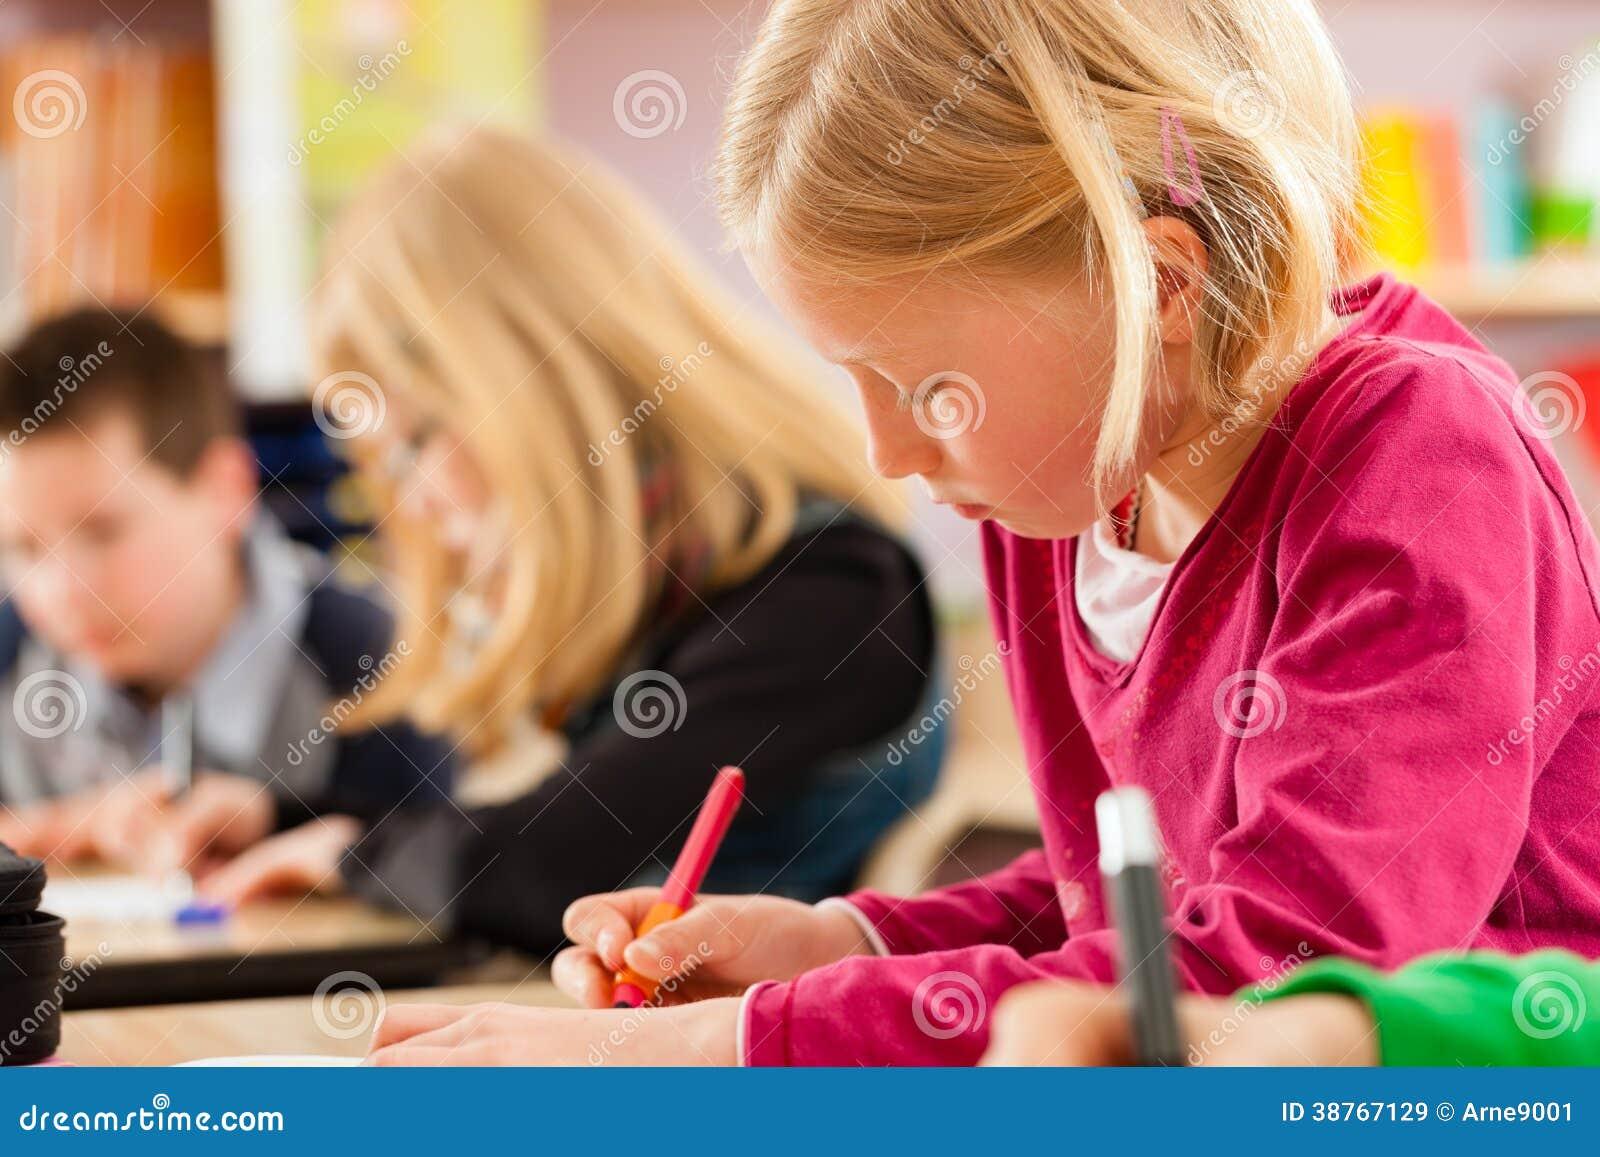 Education - Pupils at school doing homework